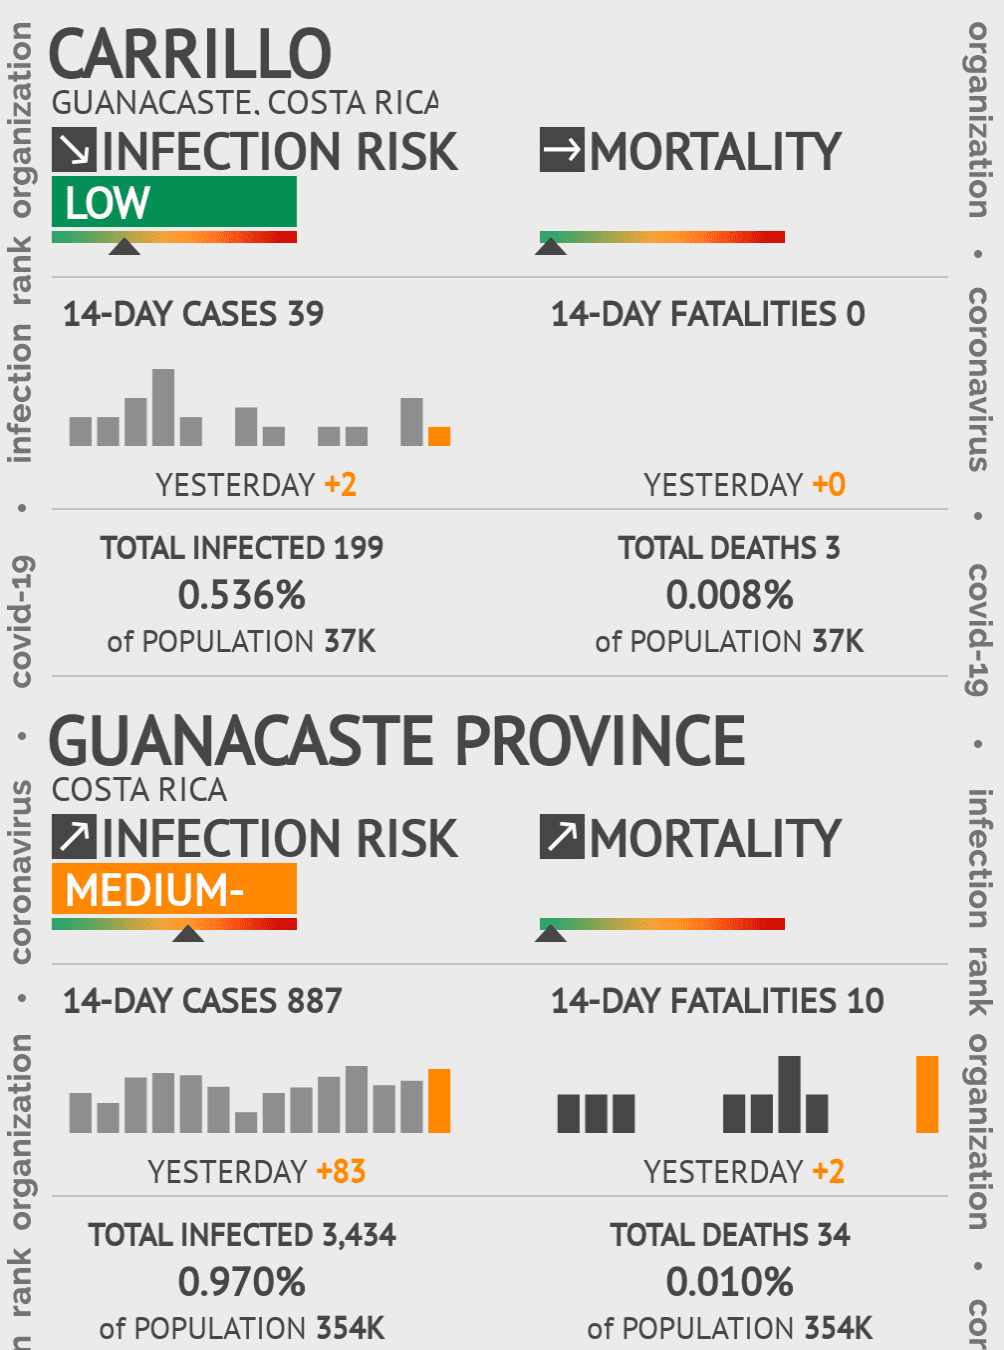 Carrillo Coronavirus Covid-19 Risk of Infection on January 04, 2021